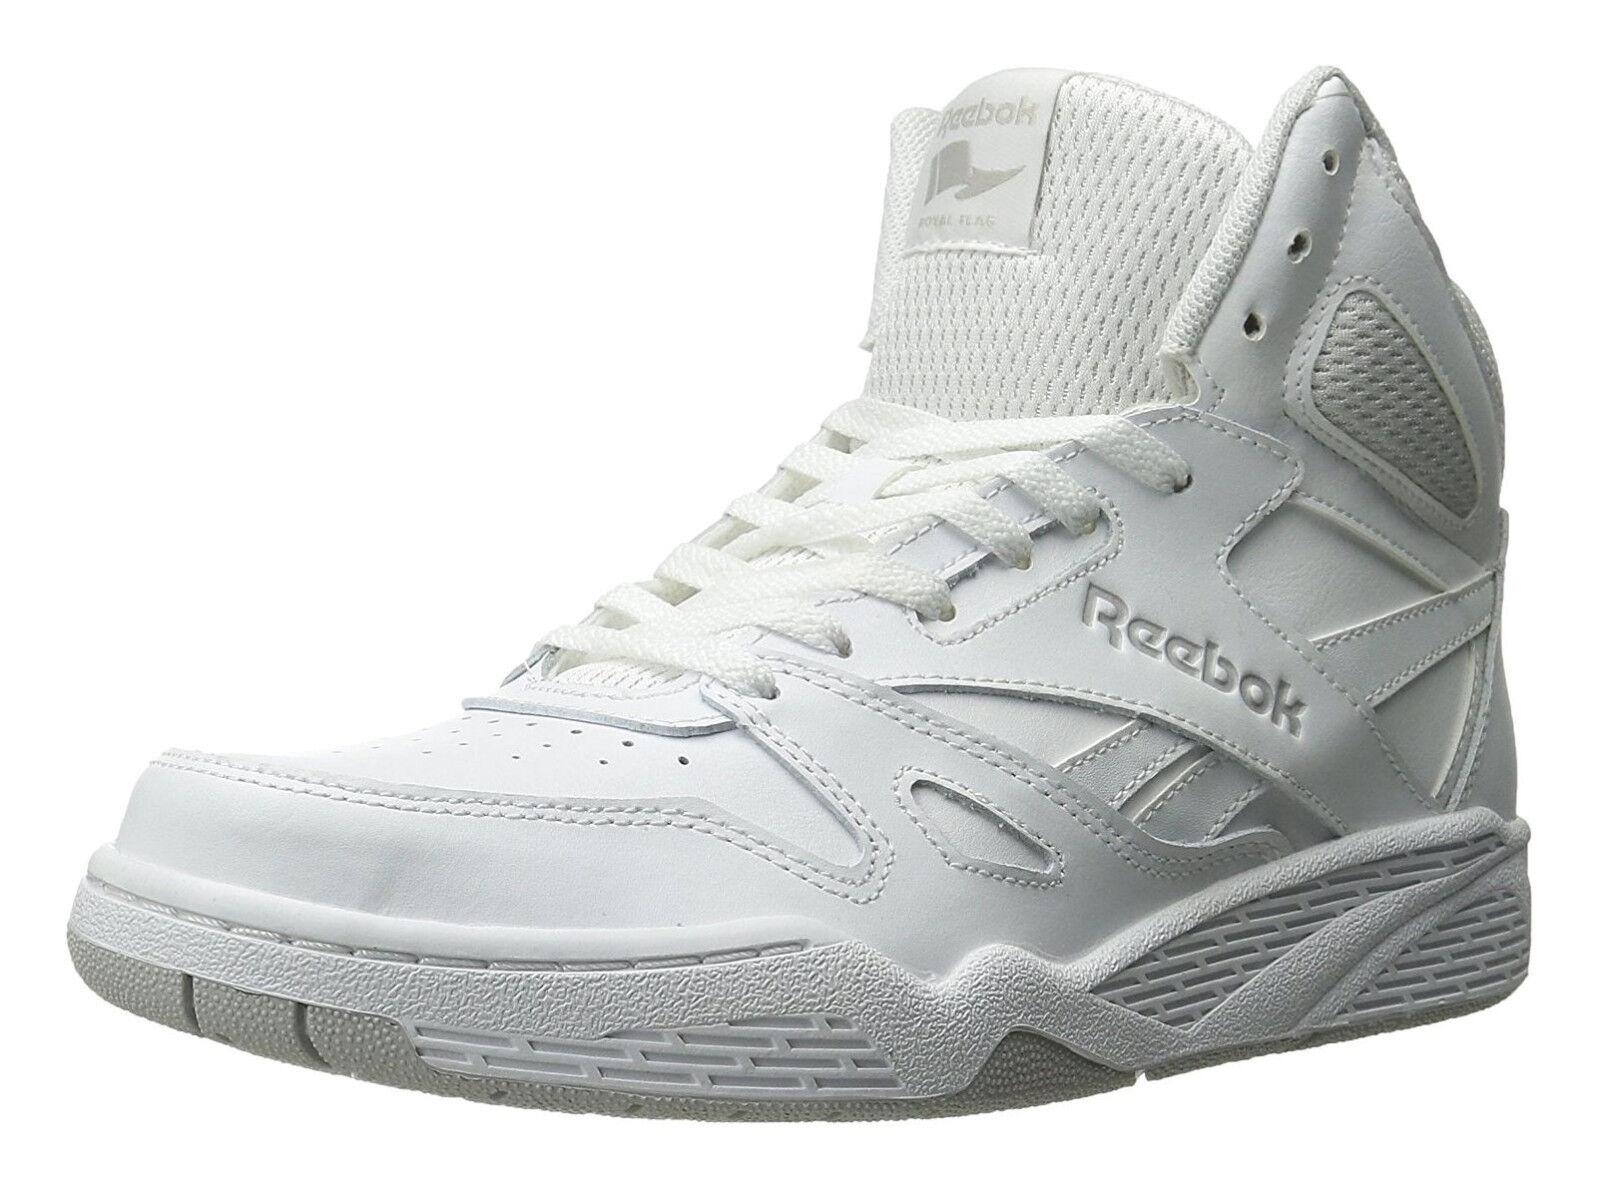 Acero blancoooo Hi BB4500 Real Reebok Baloncesto Hombre